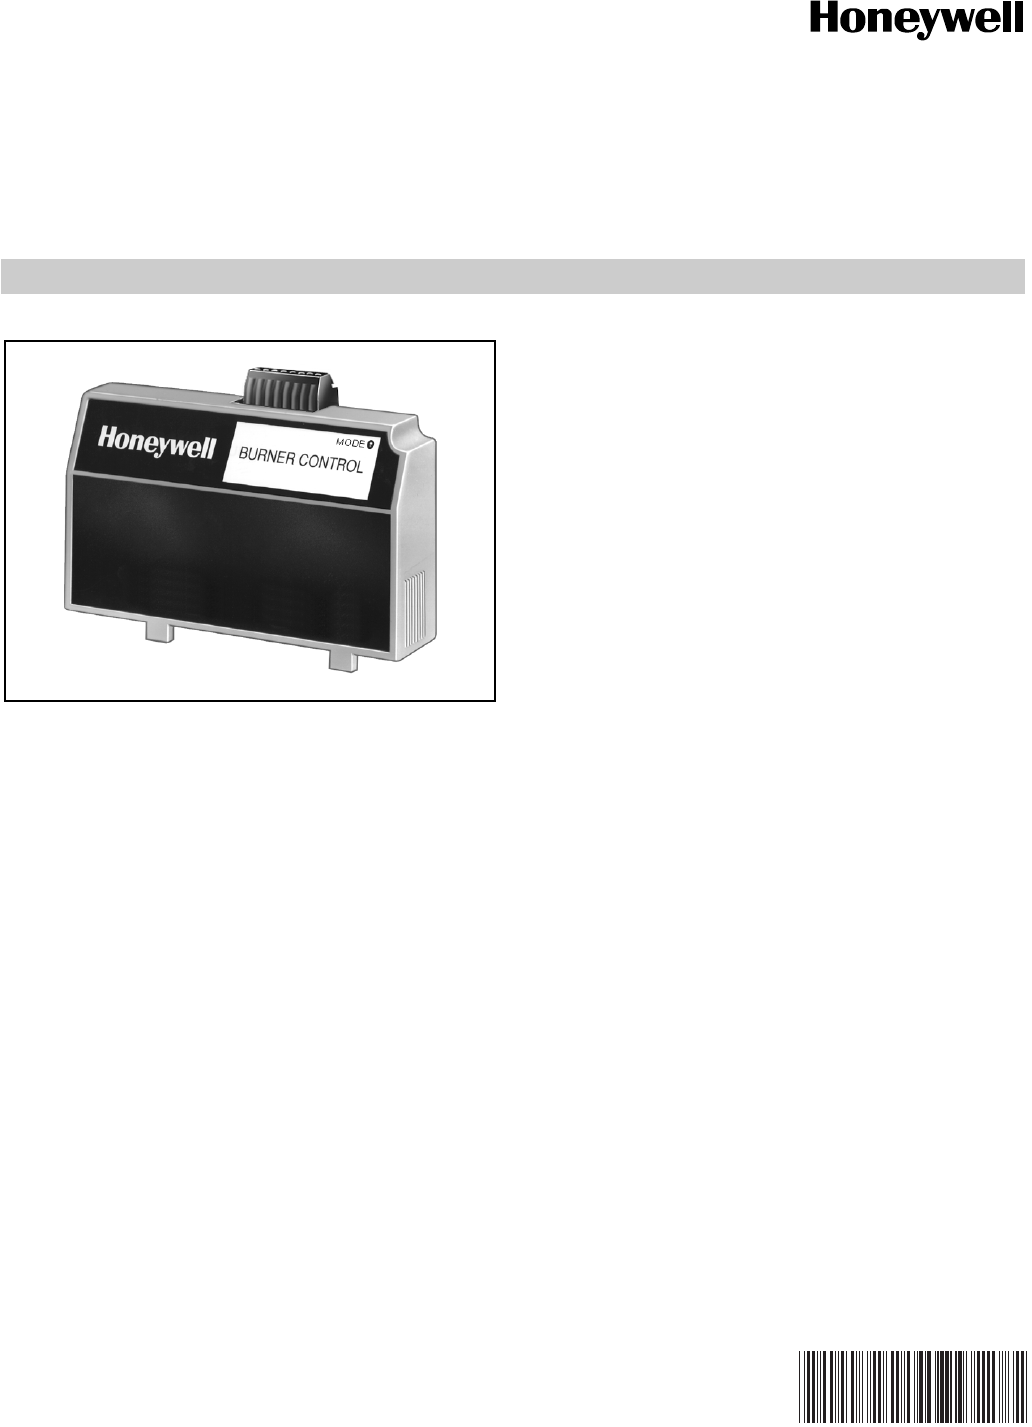 Honeywell 7800 Users Manual 65 0228 SERIES S7810B MultiDrop Switch Module